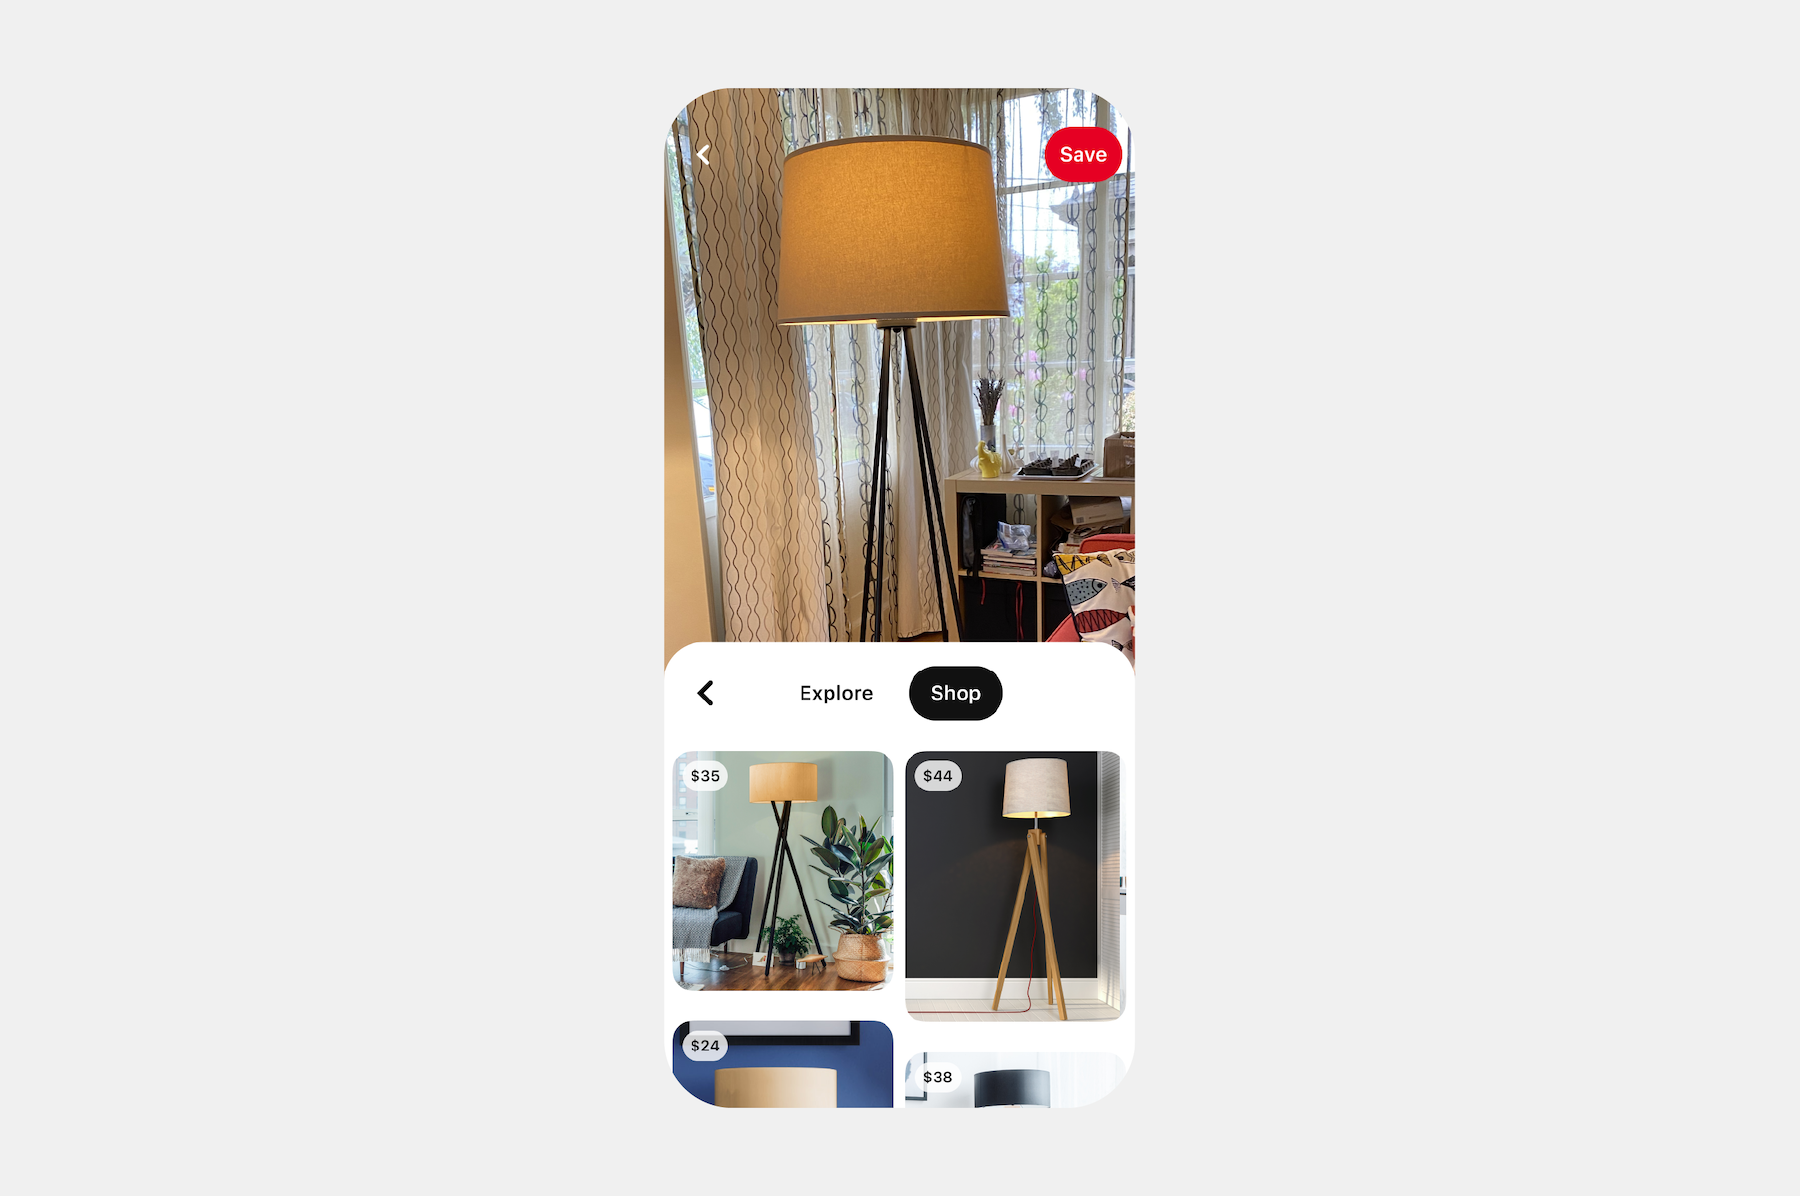 pinterest想利用图片搜索功能帮你找到同款商品图片